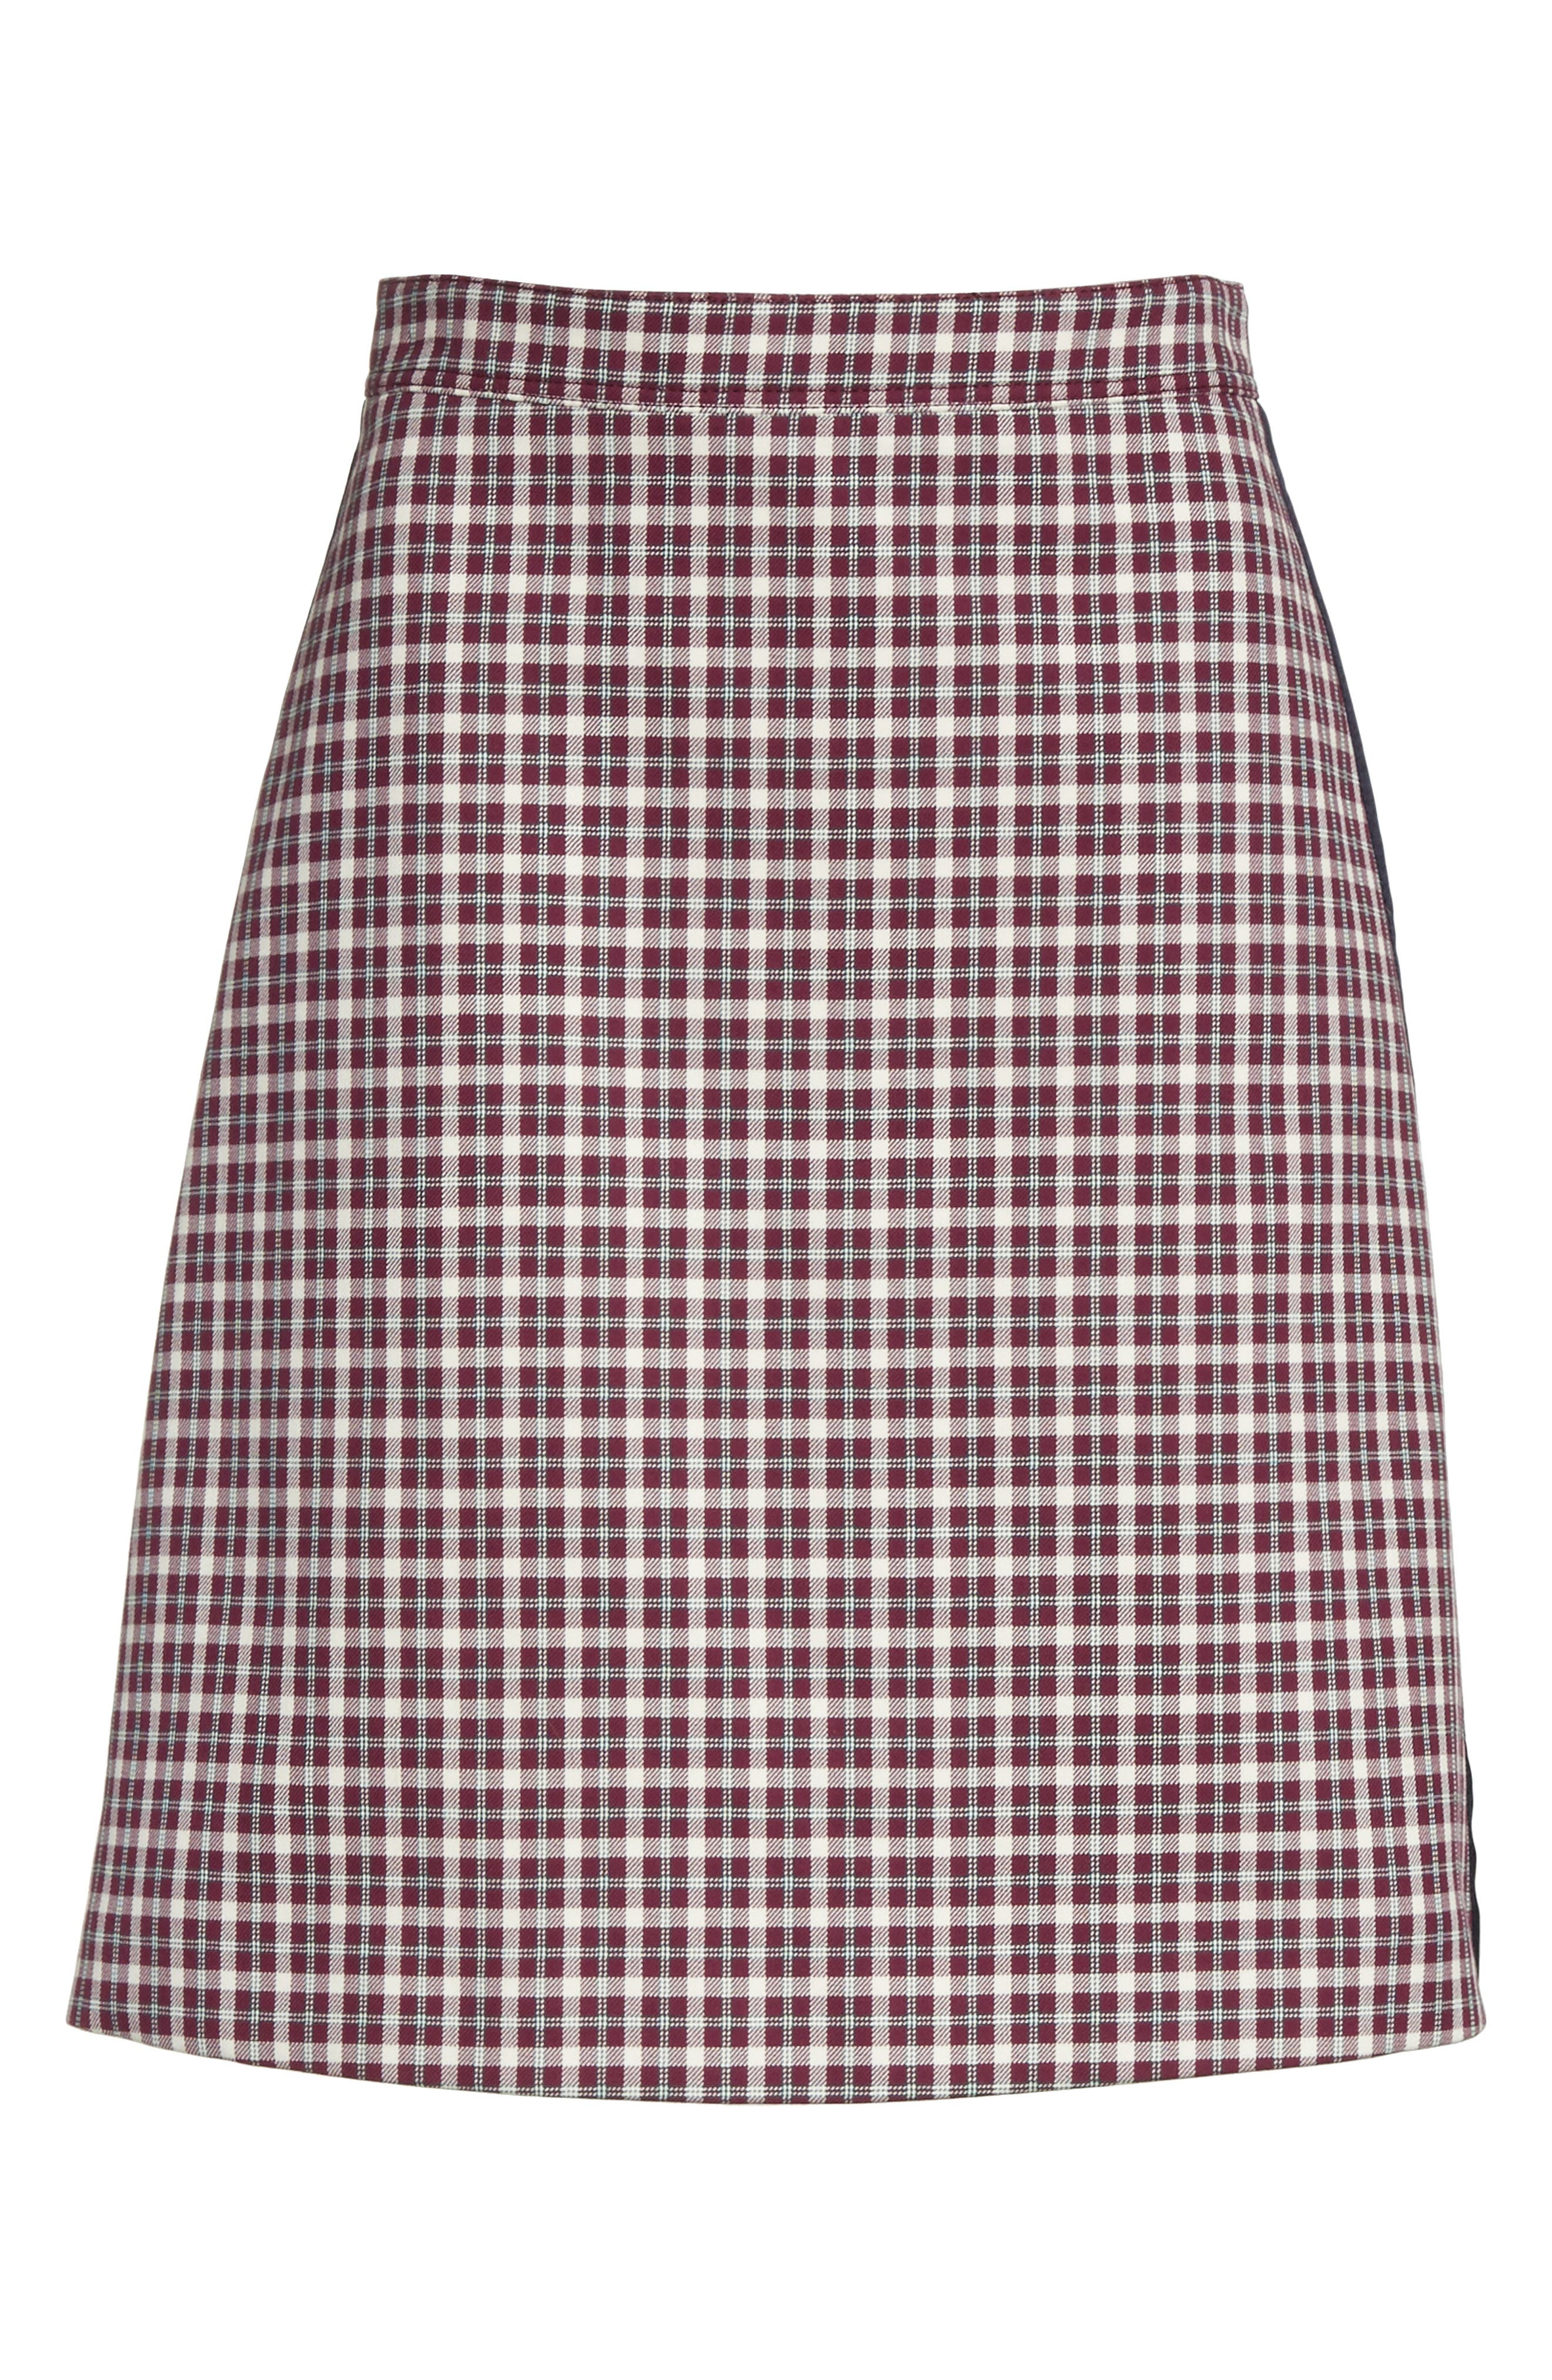 Stanforth Plaid A-Line Skirt,                             Alternate thumbnail 6, color,                             BURGUNDY